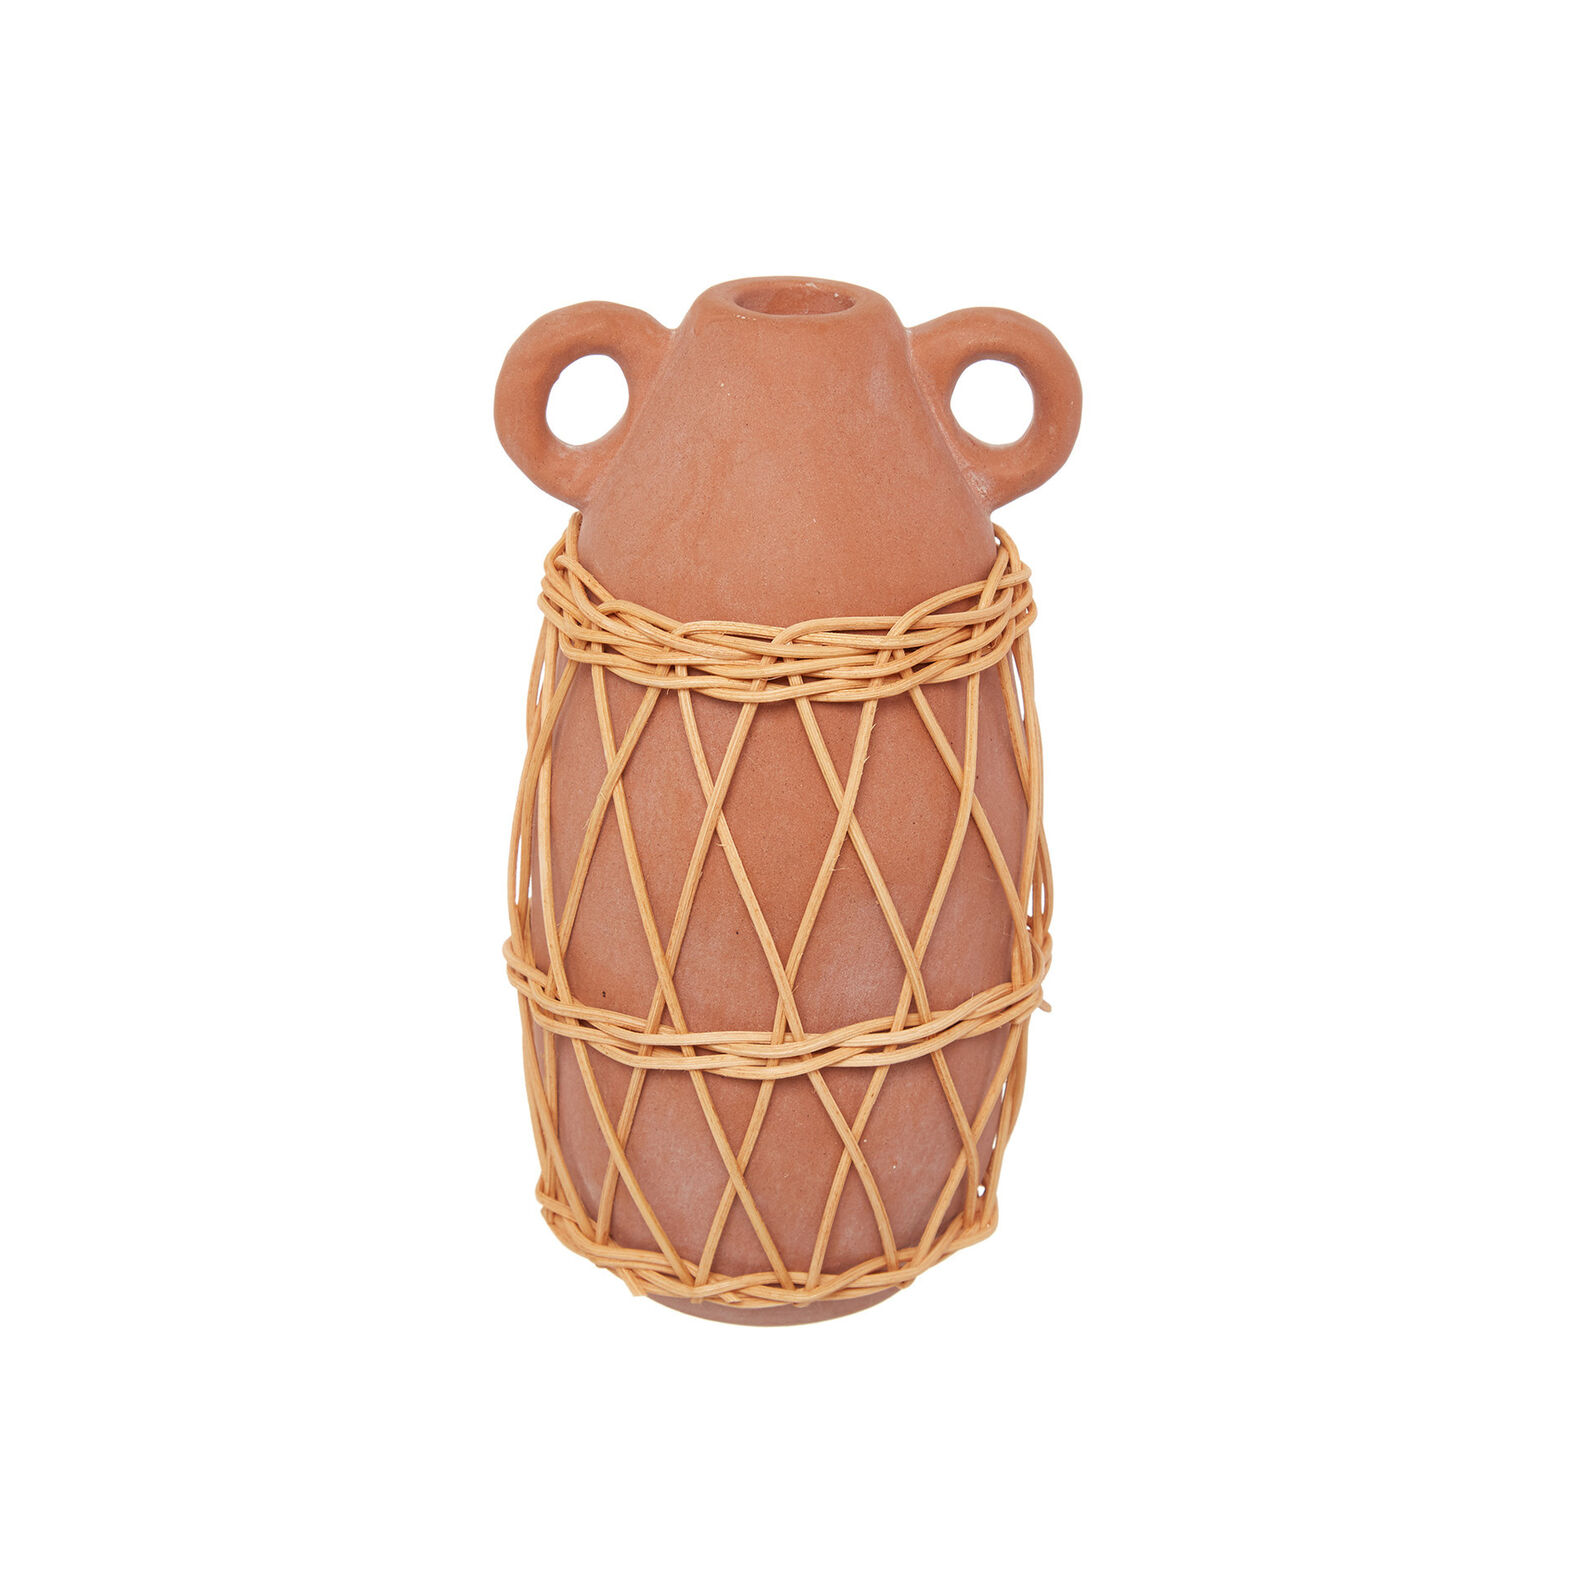 Ceramic candlestick with rattan decoration